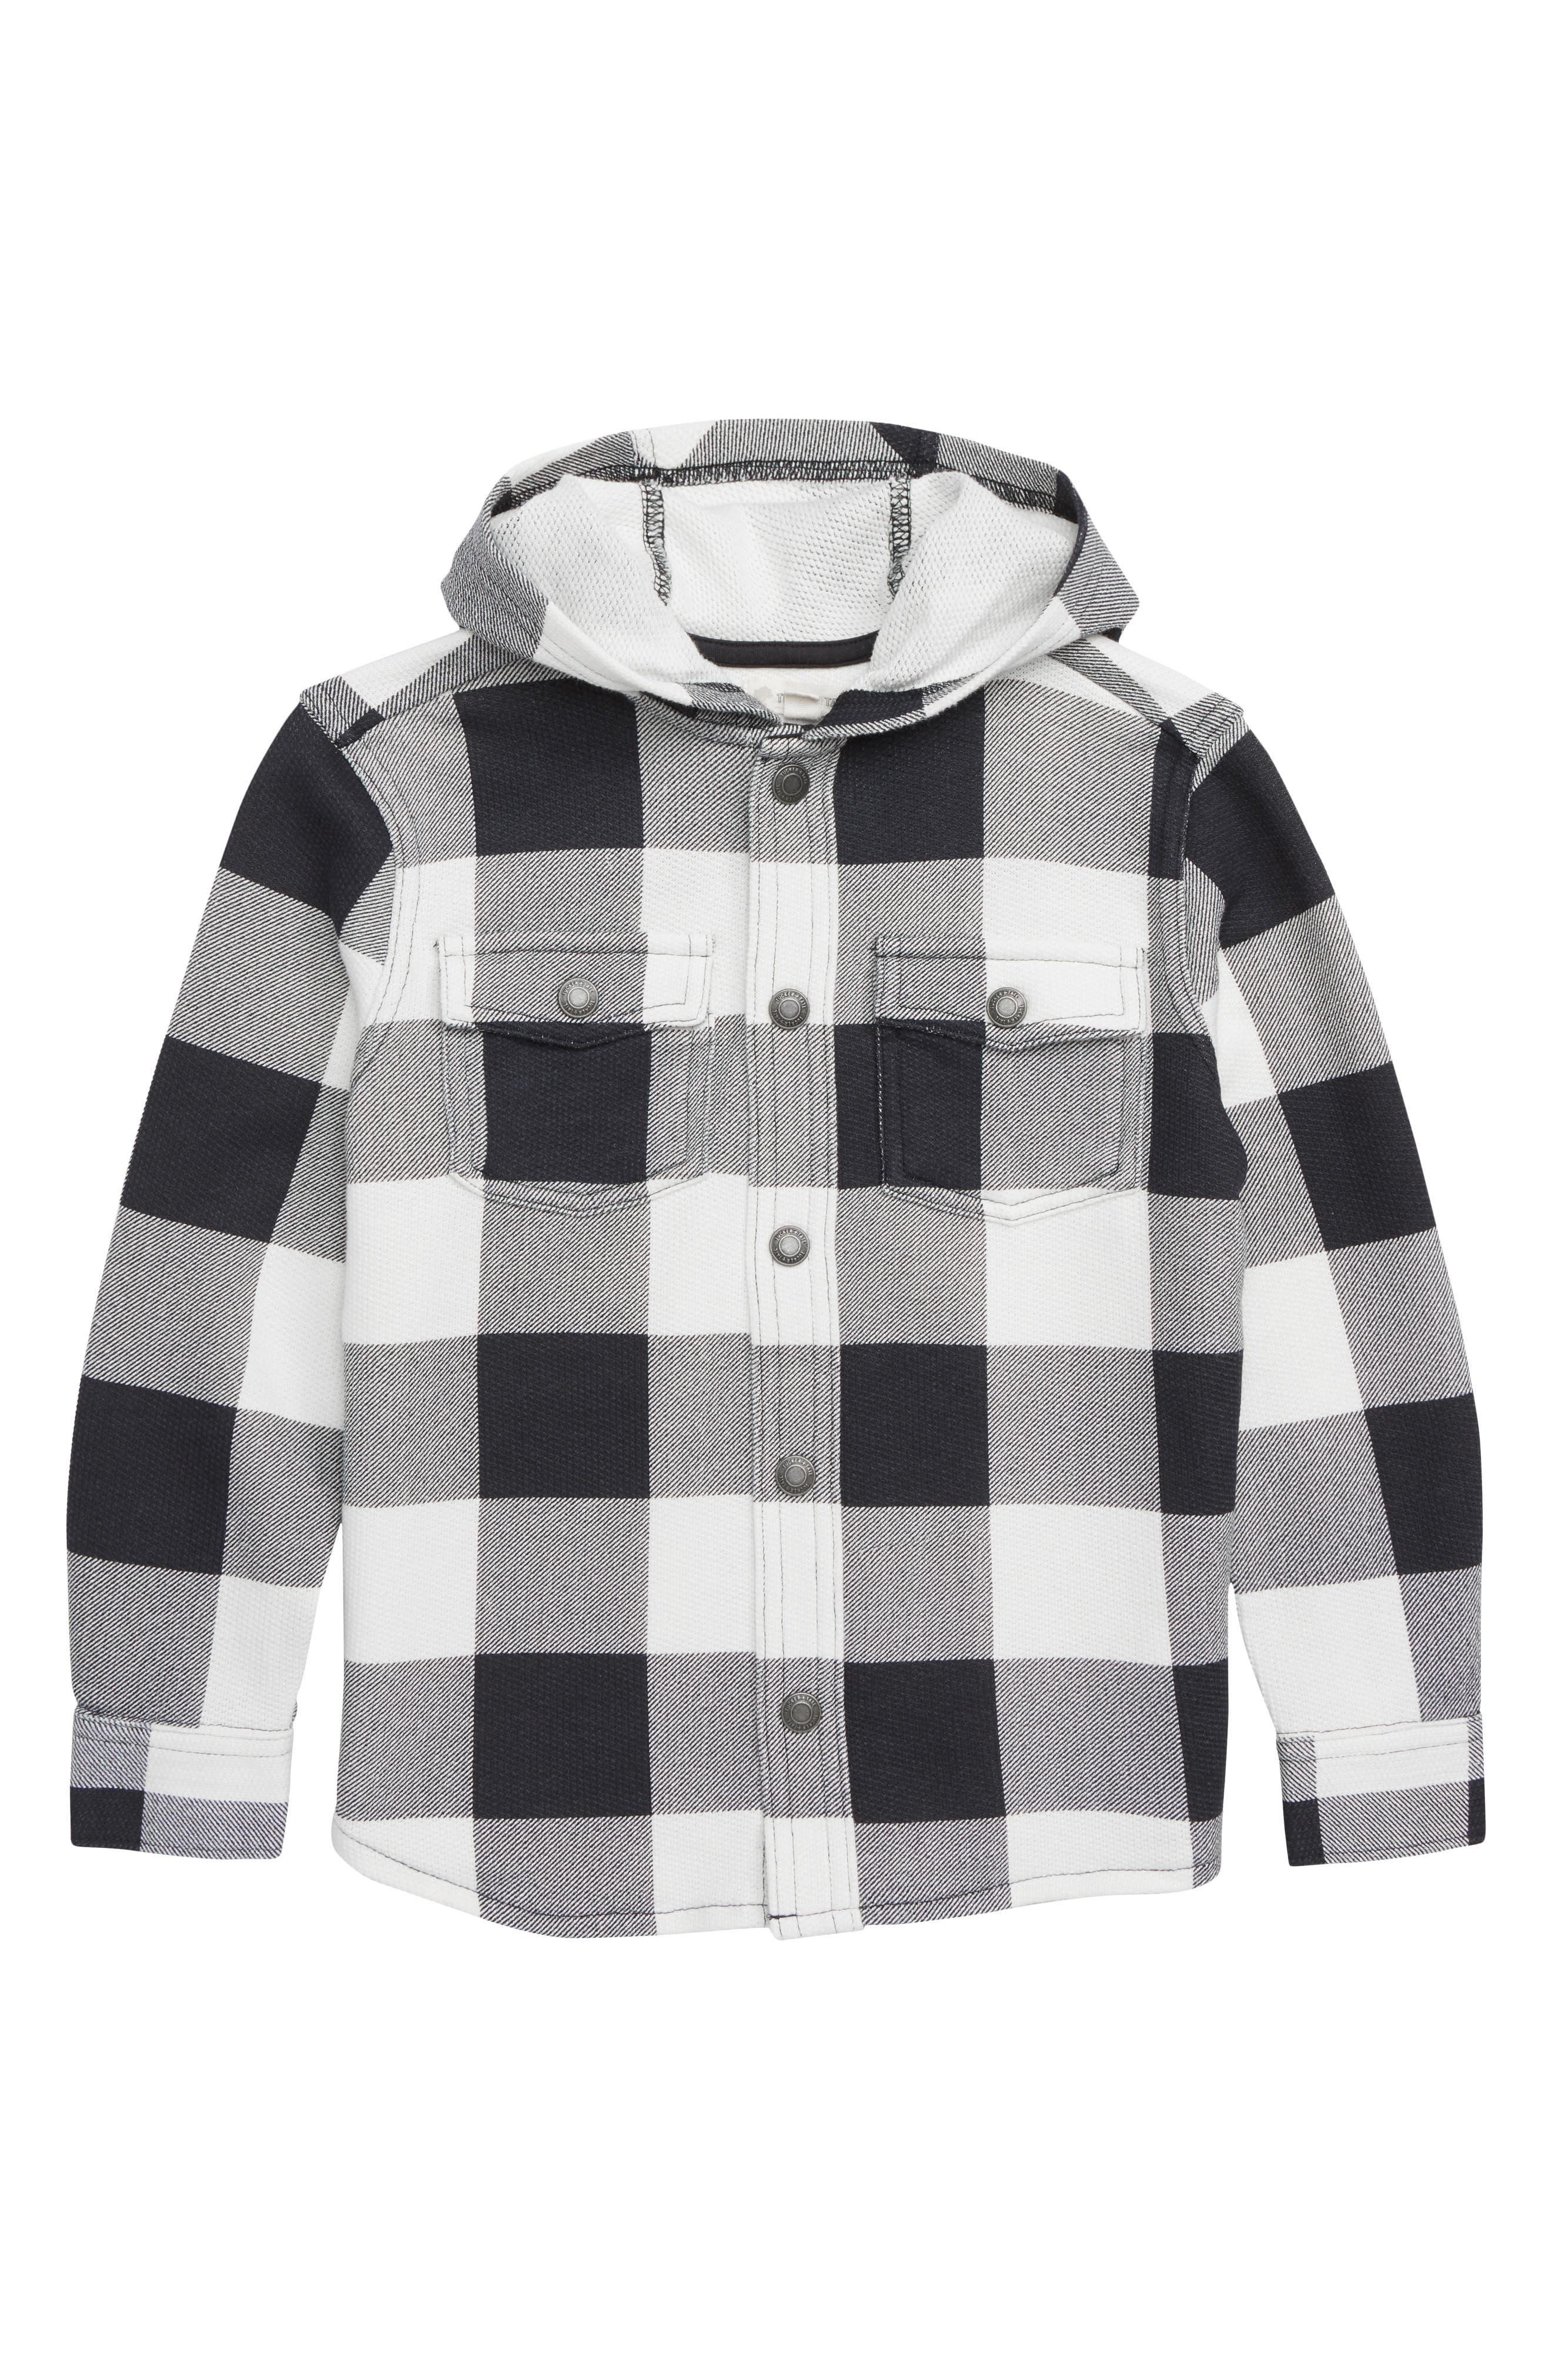 Buffalo Check Hooded Shirt,                             Main thumbnail 1, color,                             WHITE- BLACK GINGHAM